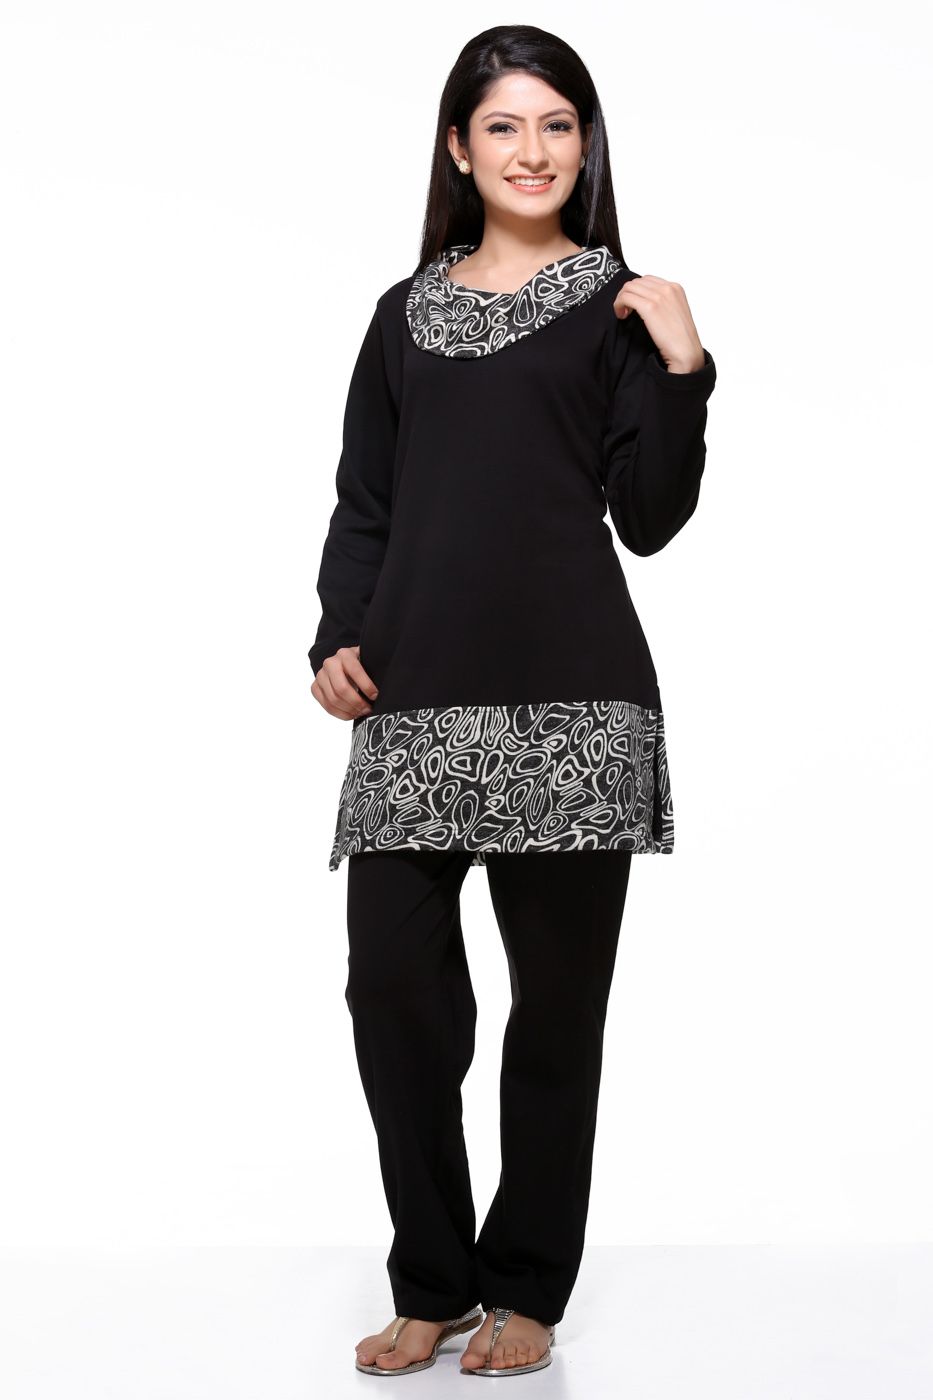 Dove Winter Night Suit Set With Zebra Print Ns11 Black